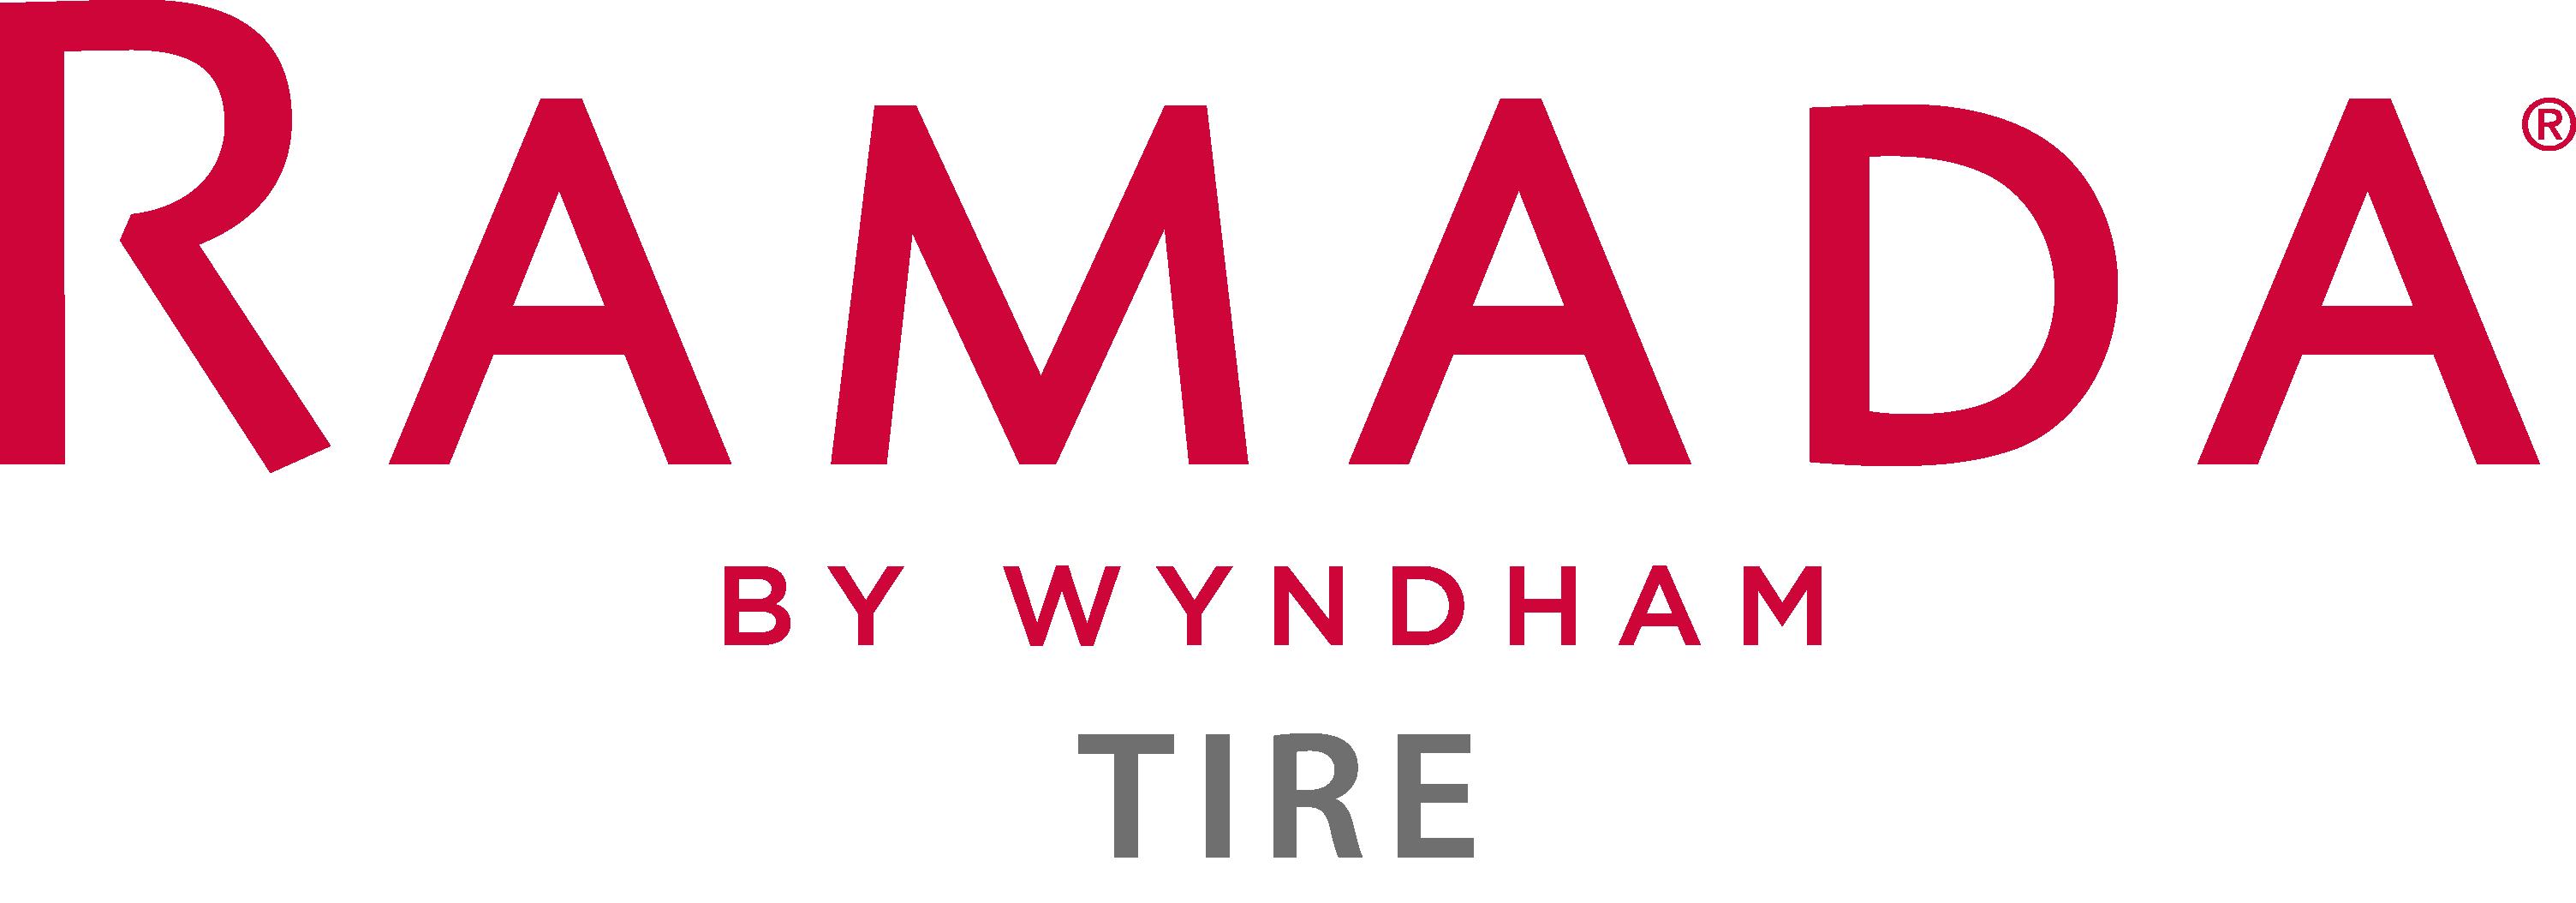 Ramada Tire